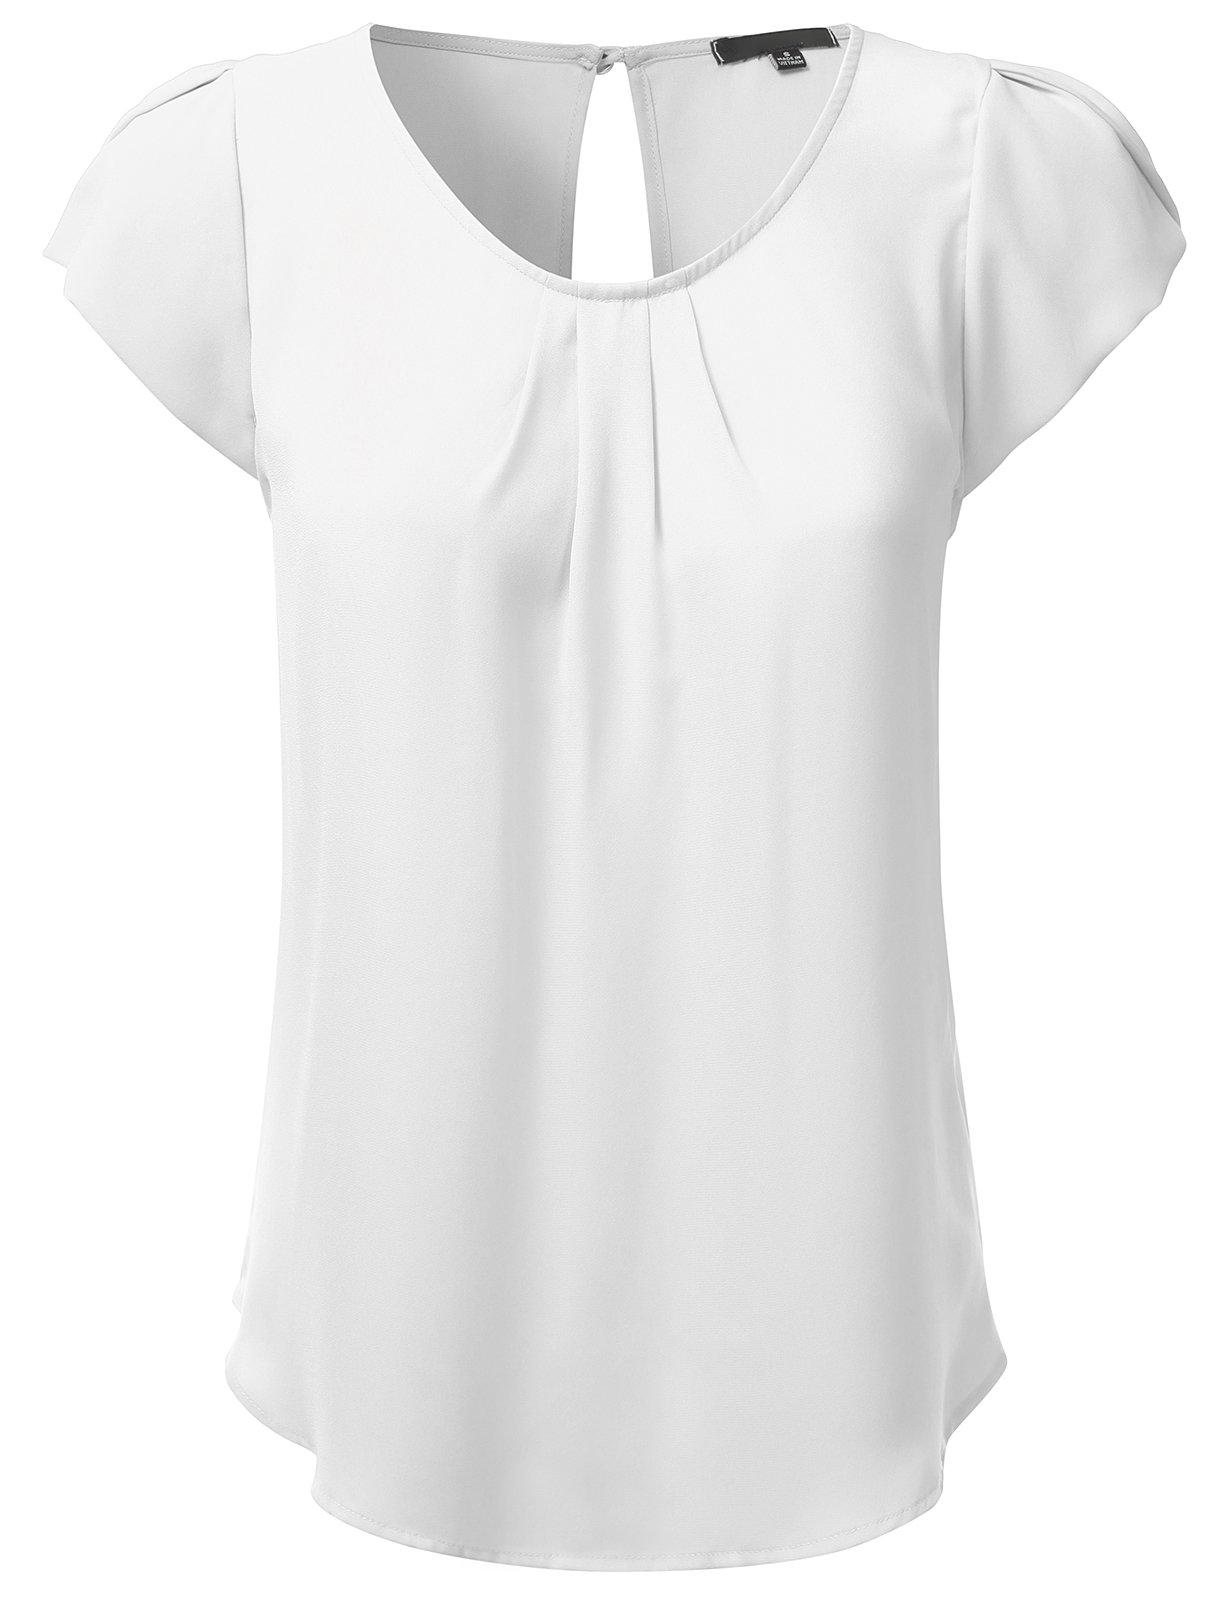 JJ Perfection Women's Petal Short Sleeve Woven Blouse OFFWHITE M